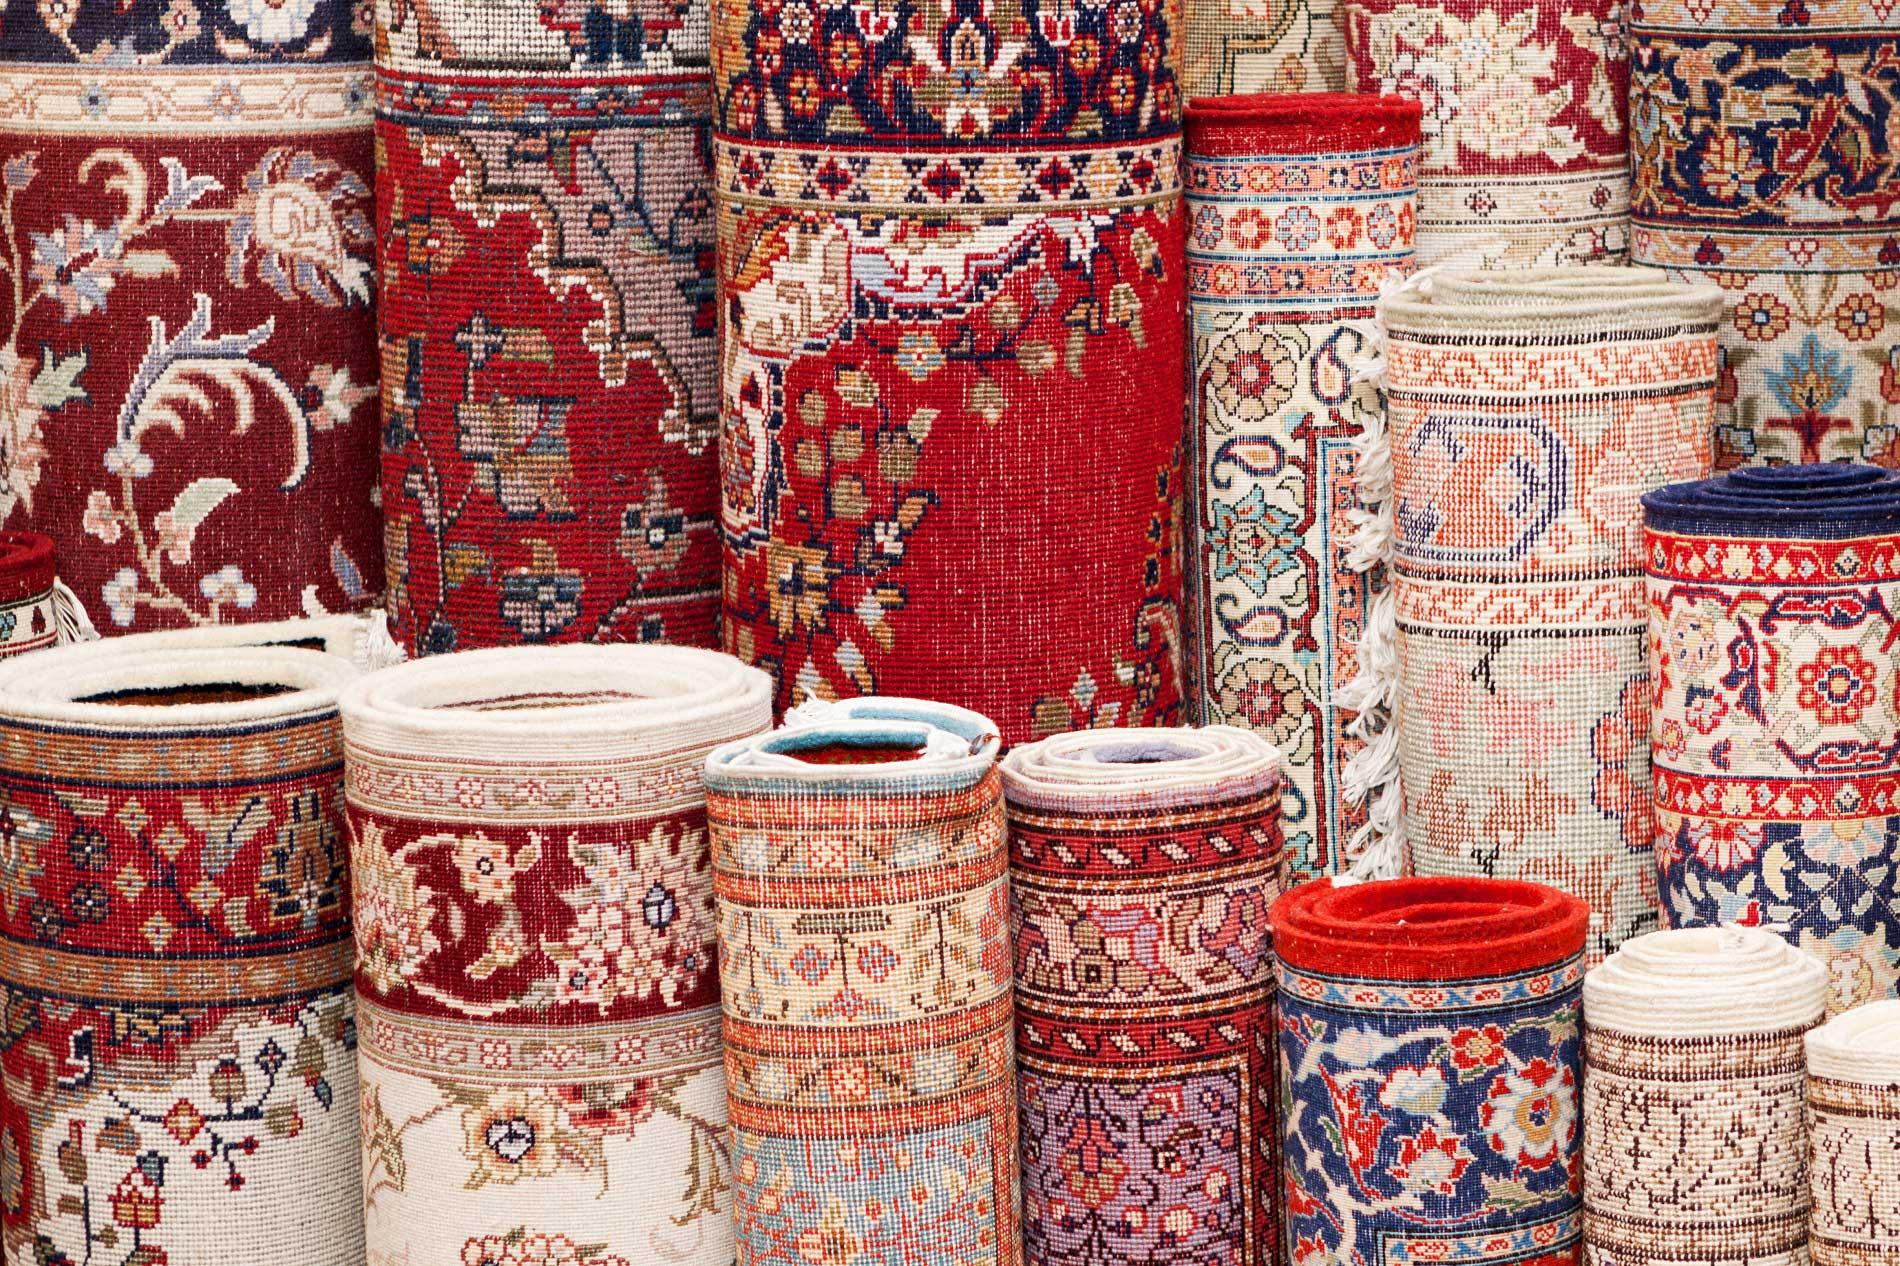 Tappeti artigianali persiani arrotolati